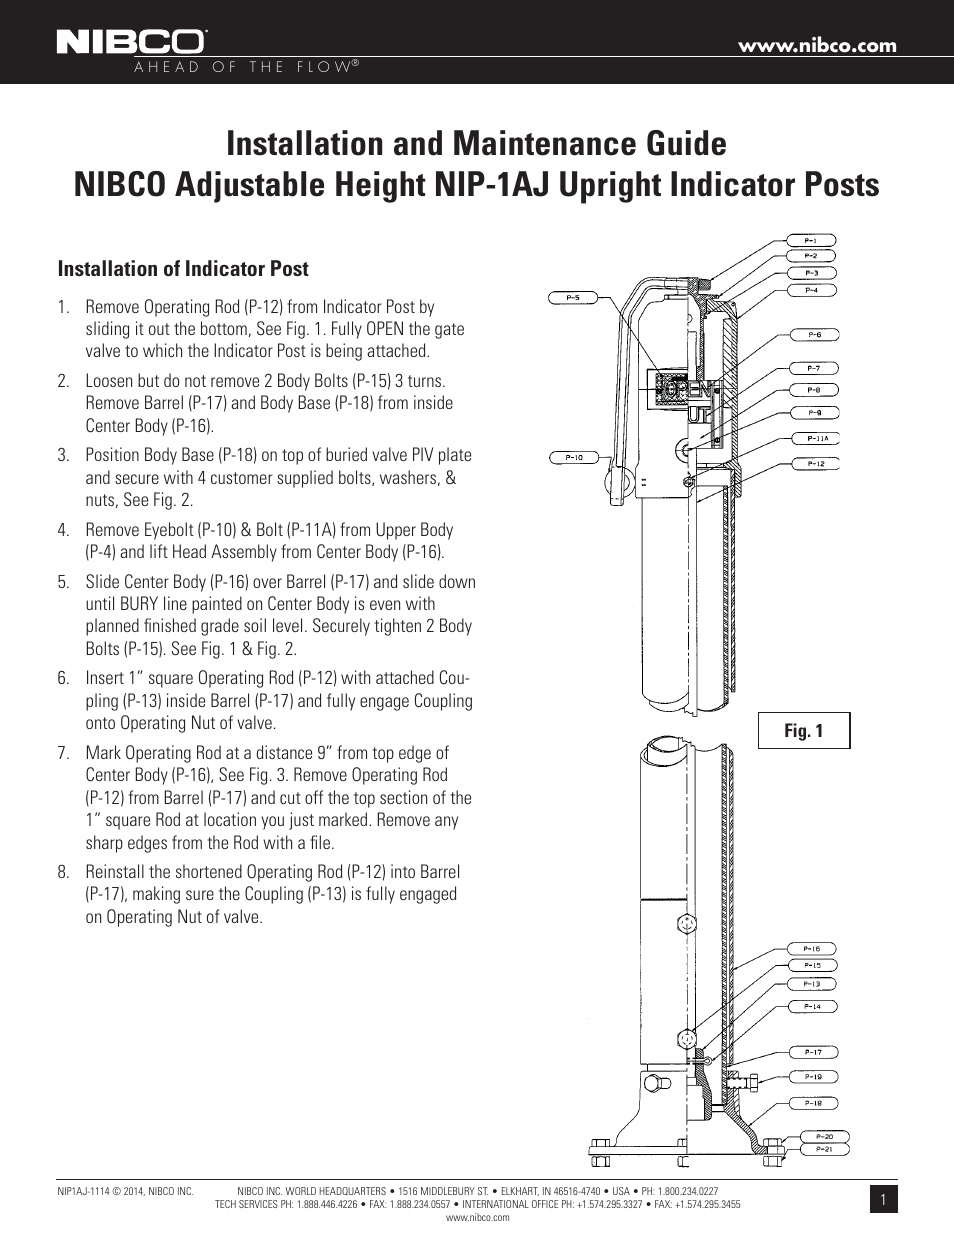 NIBCO NIP-1AJ Indicator User Manual | 4 pages on